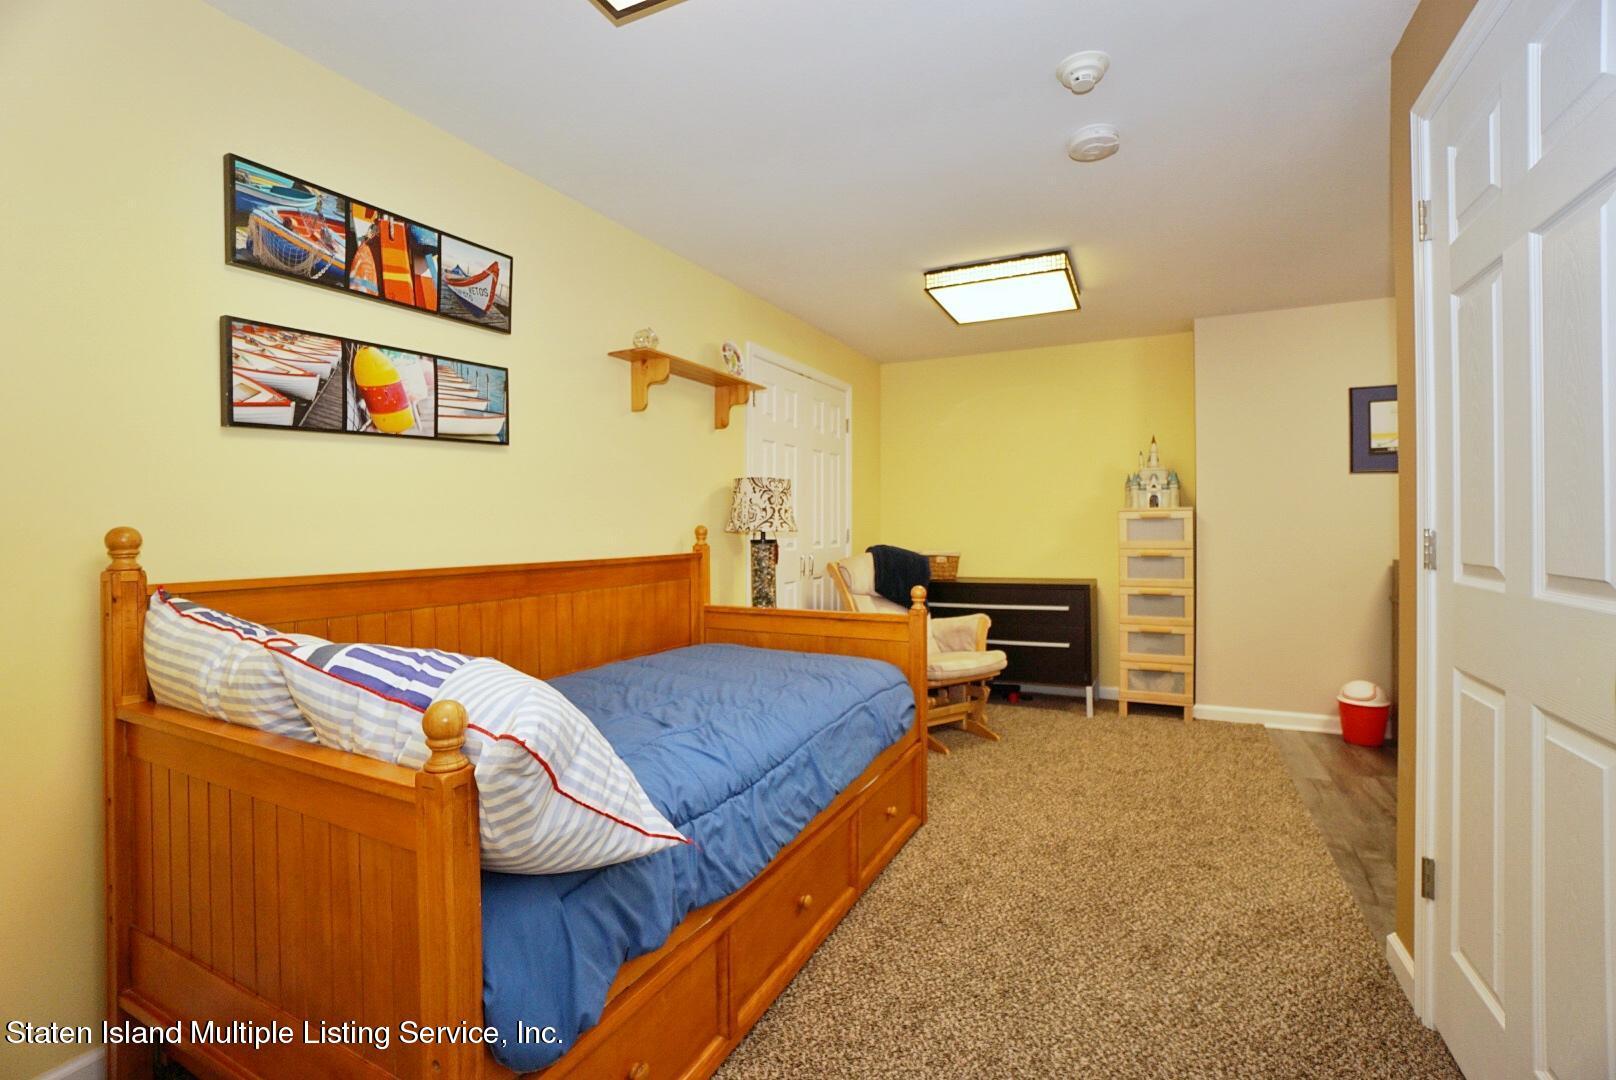 Single Family - Detached 31 Belwood Loop  Staten Island, NY 10307, MLS-1143133-58